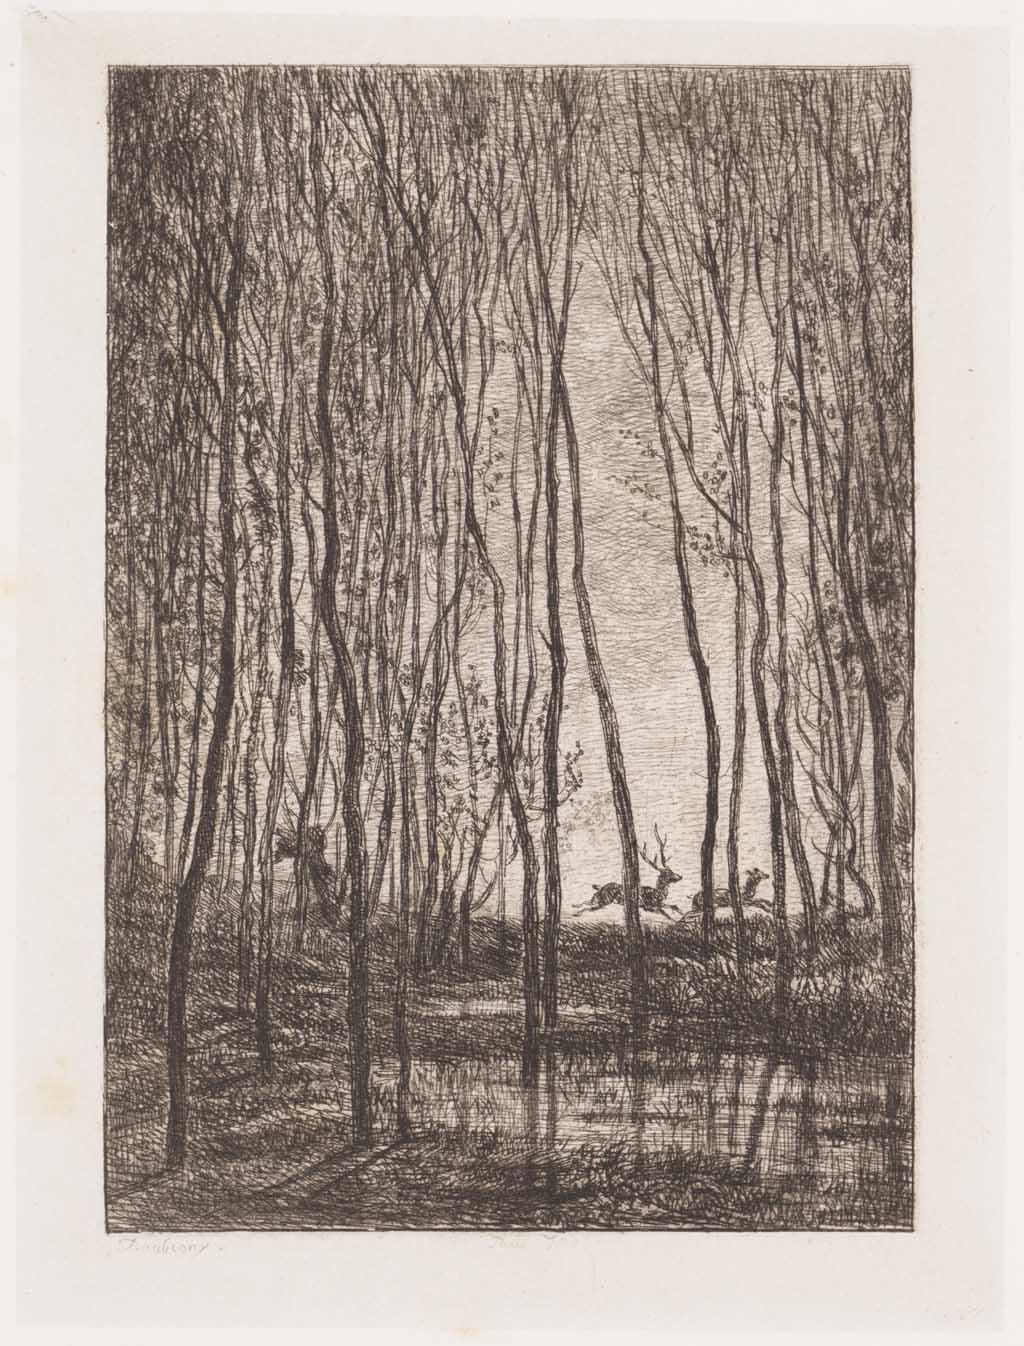 Bos met meertje